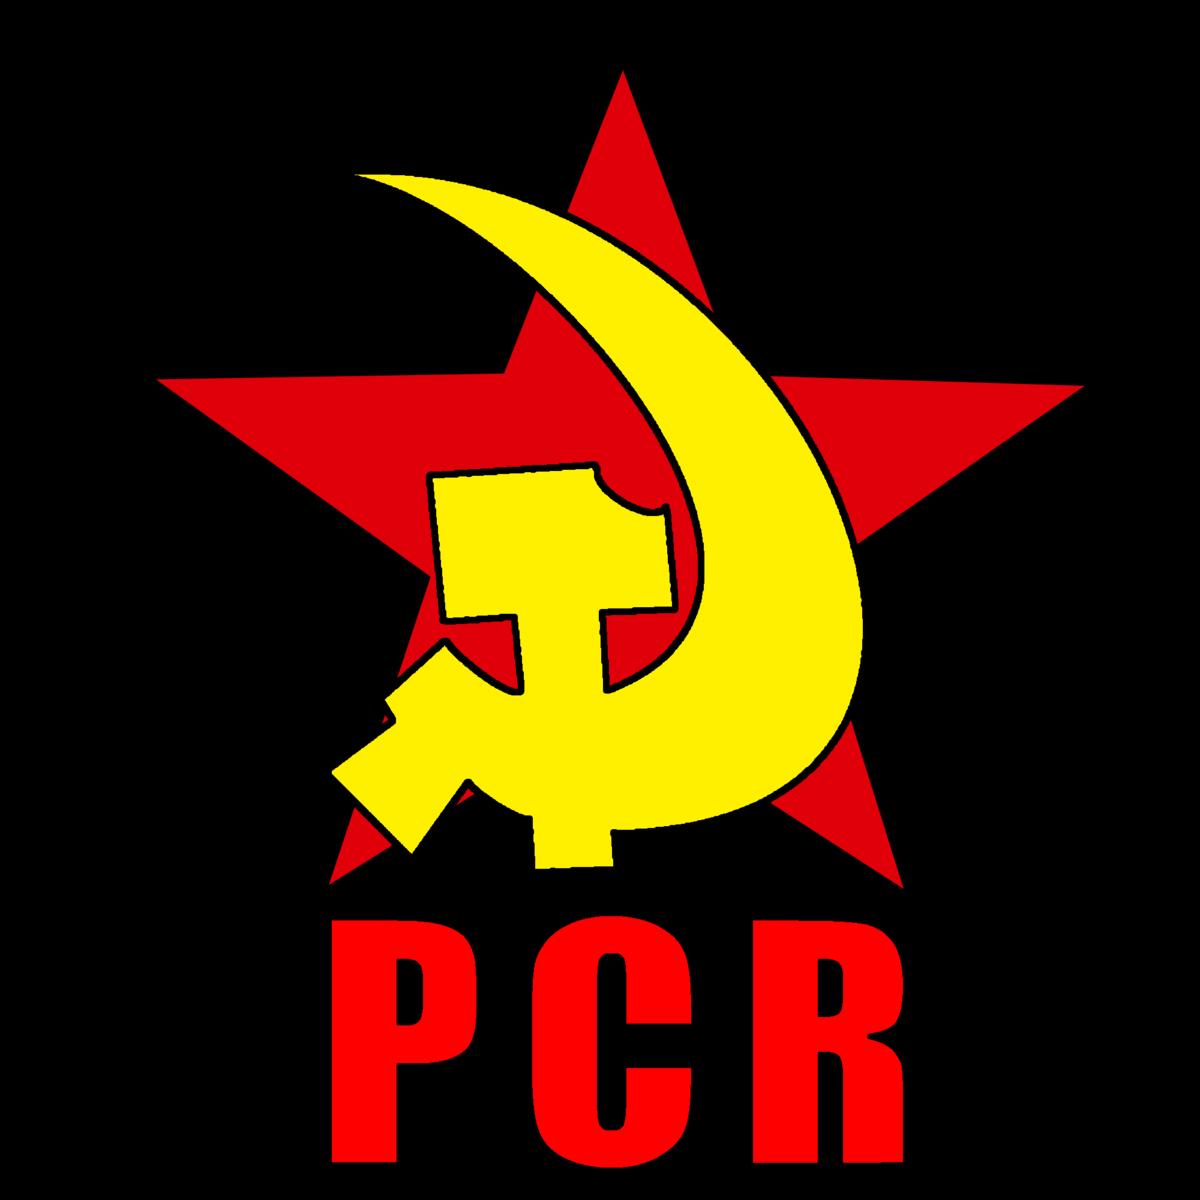 La internacional comunismo pdf creator